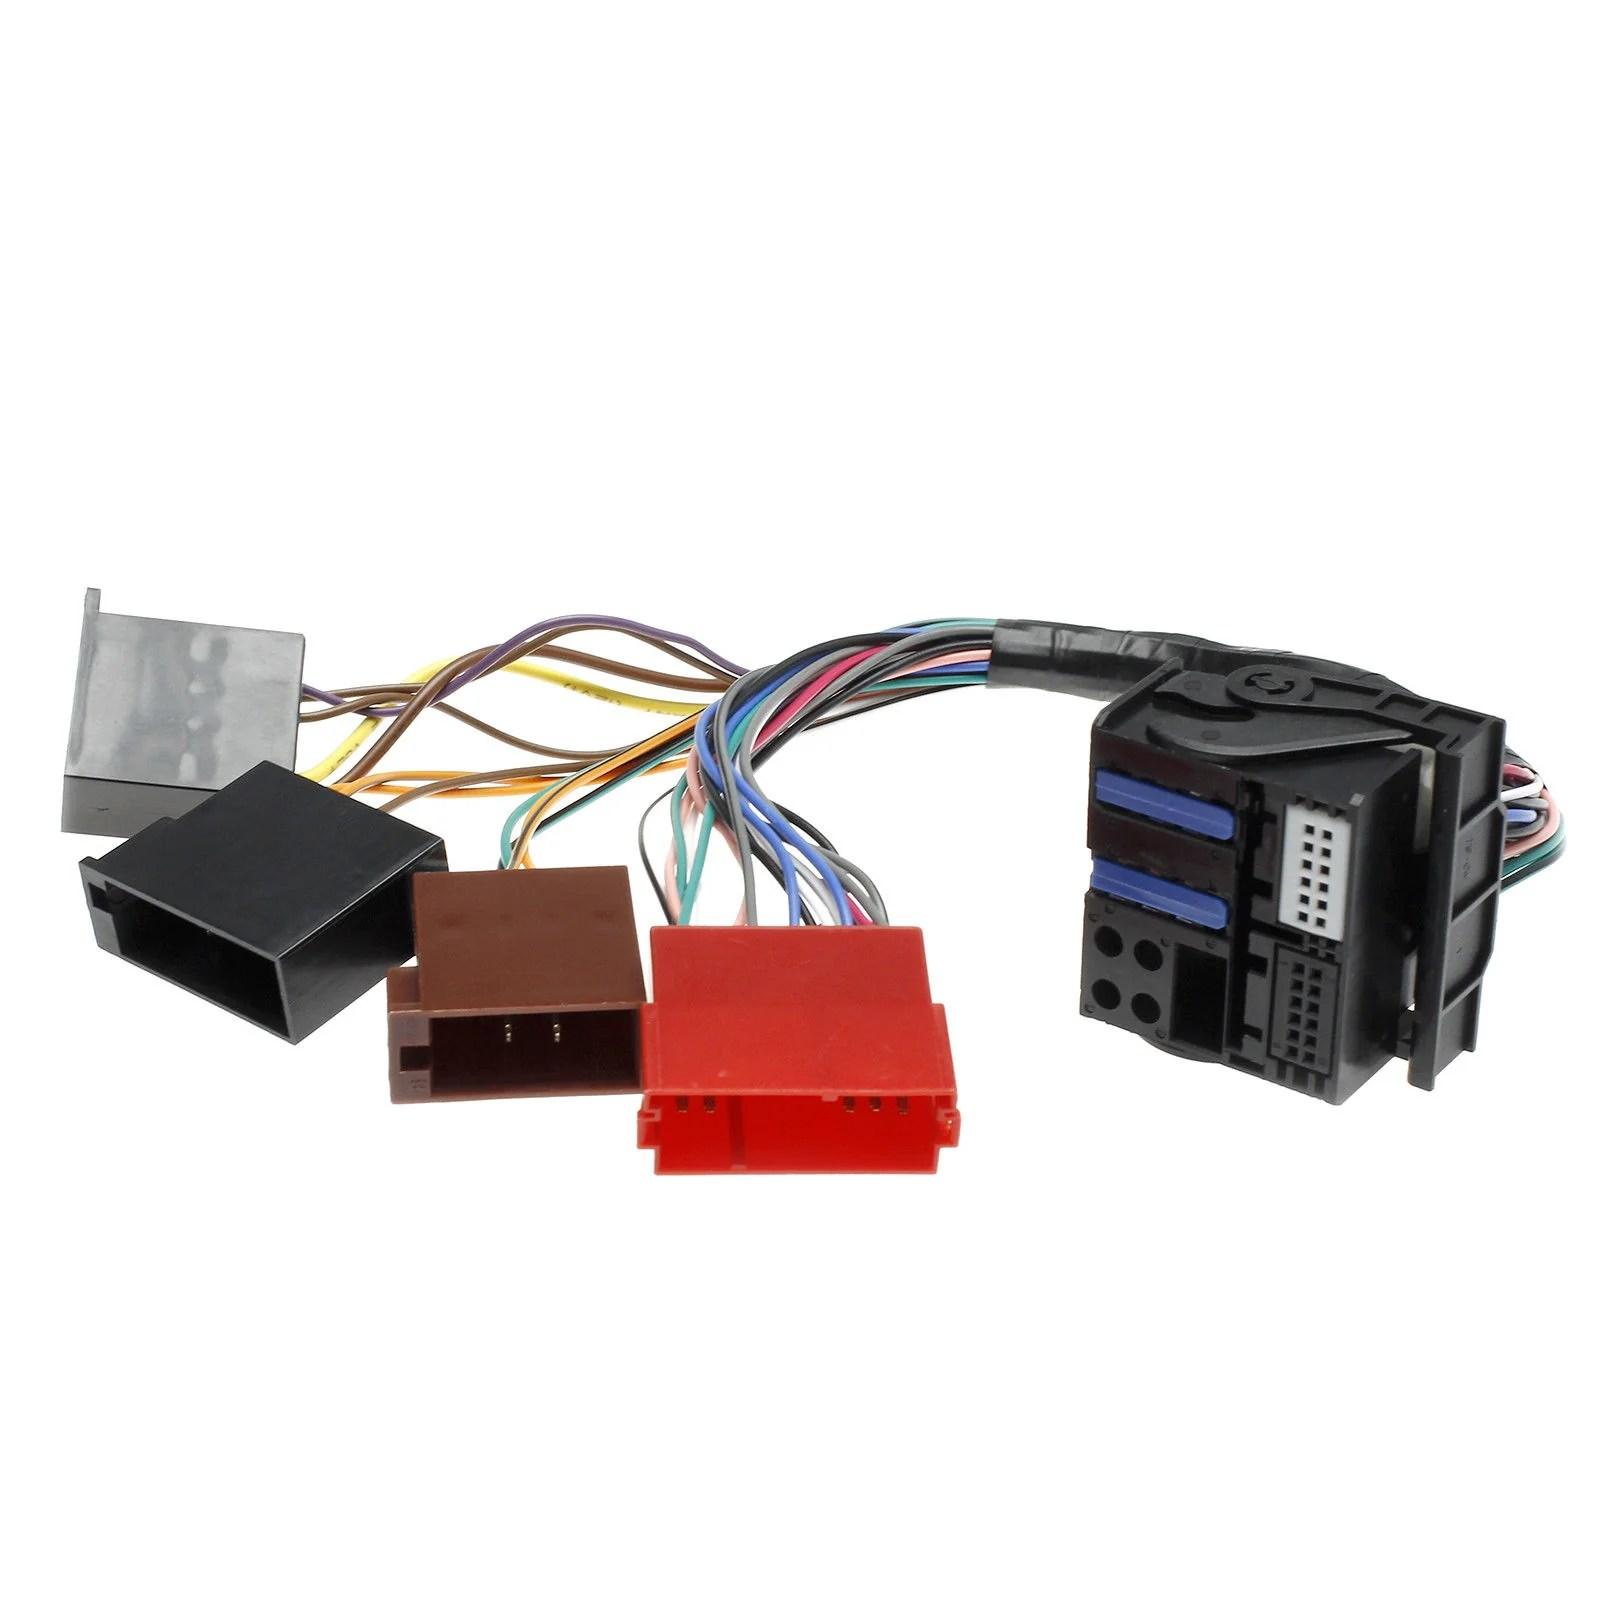 adapter wire harness for volkswagen vw premium 5 to premium 6 audi navigation plus rnse  [ 1600 x 1600 Pixel ]